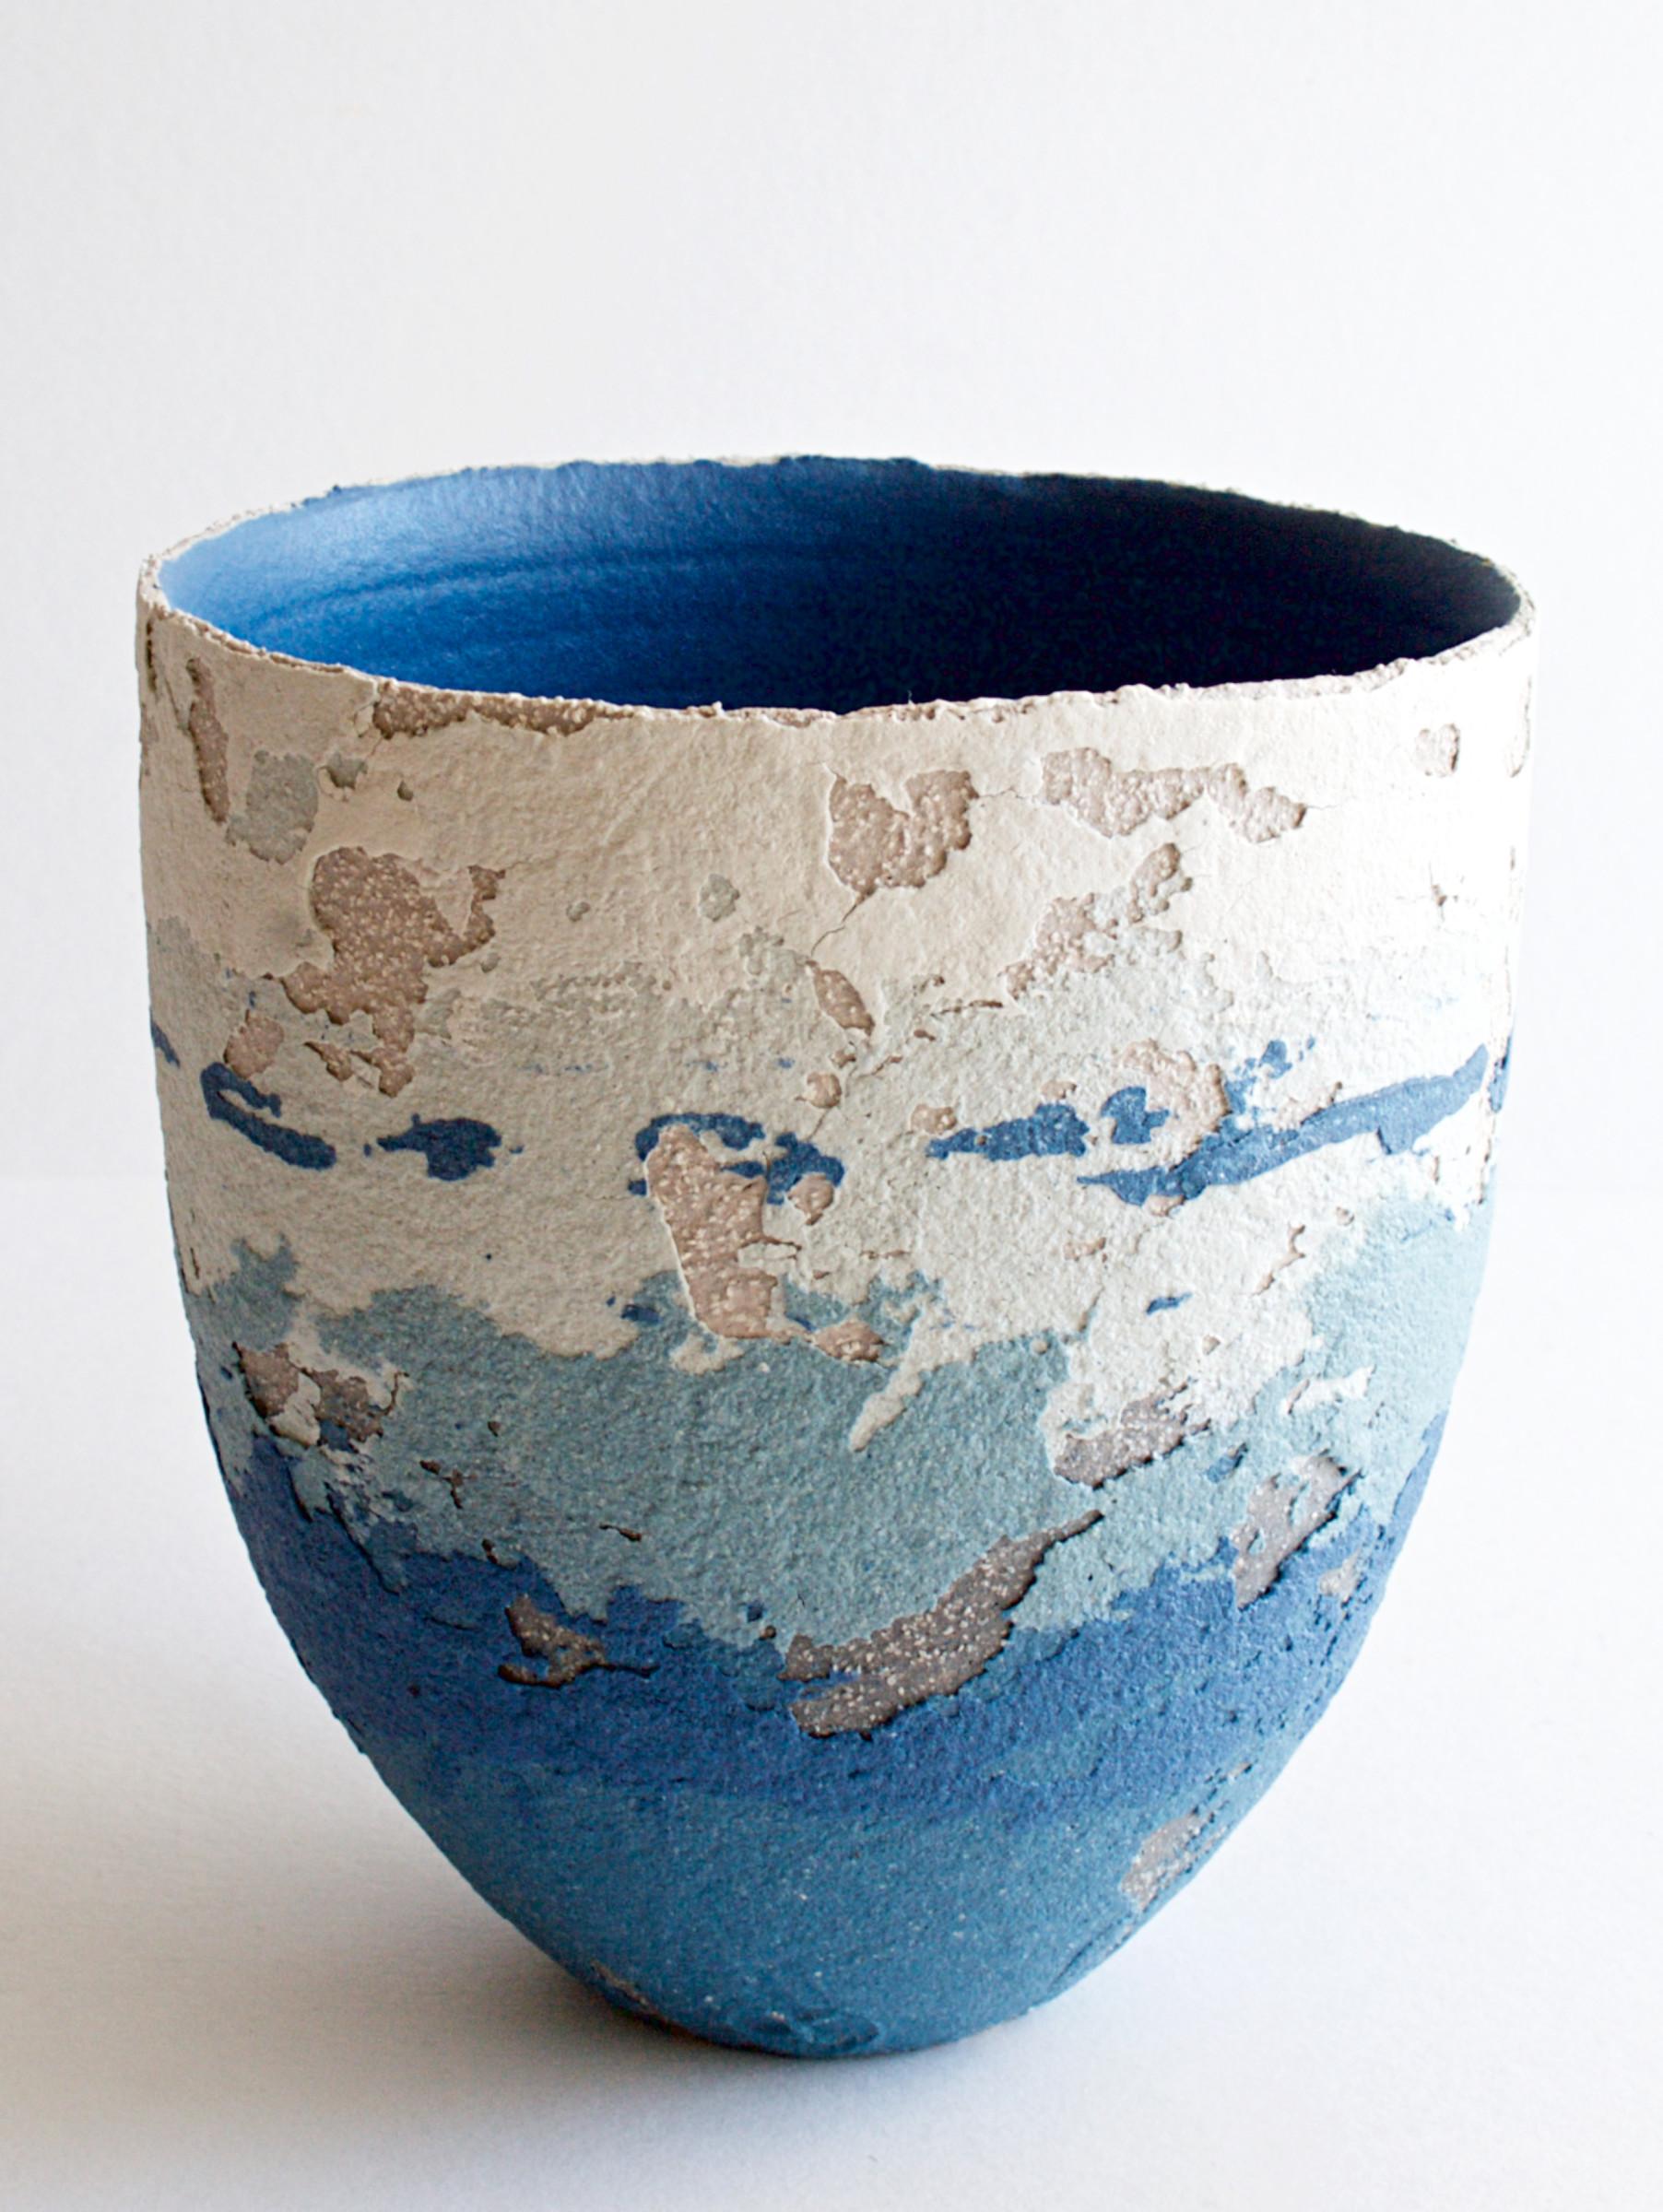 "<span class=""link fancybox-details-link""><a href=""/artists/79-clare-conrad/works/6930-clare-conrad-vessel-2020/"">View Detail Page</a></span><div class=""artist""><strong>Clare Conrad</strong></div> <div class=""title""><em>Vessel</em>, 2020</div> <div class=""medium"">Stoneware</div> <div class=""dimensions"">h. 11cm</div><div class=""copyright_line"">Copyright The Artist</div>"